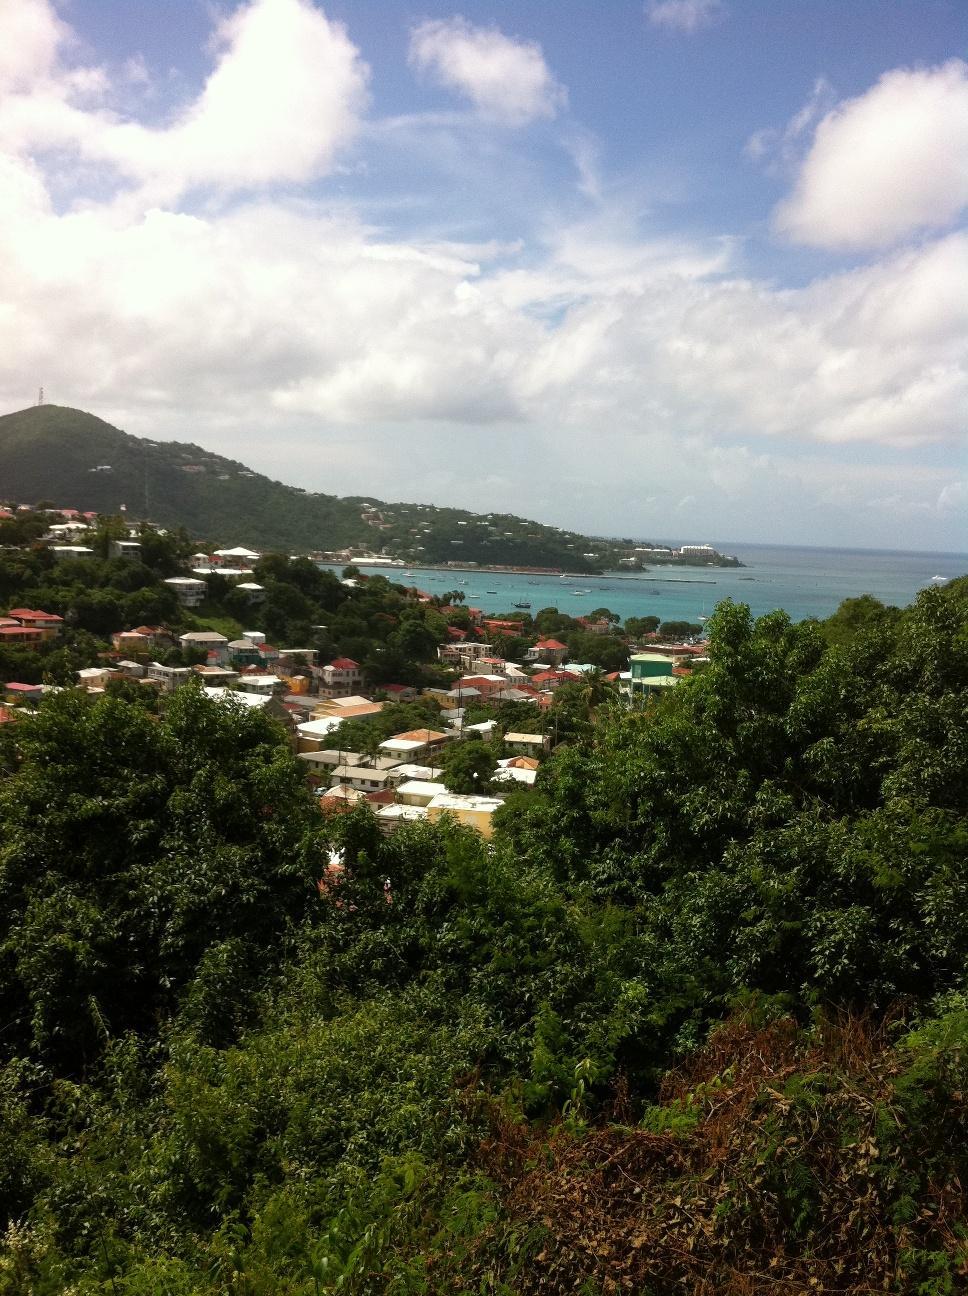 Condominium for Sale at Harbour House 14 Agnes Fancy GNS Harbour House 14 Agnes Fancy GNS St Thomas, Virgin Islands 00802 United States Virgin Islands